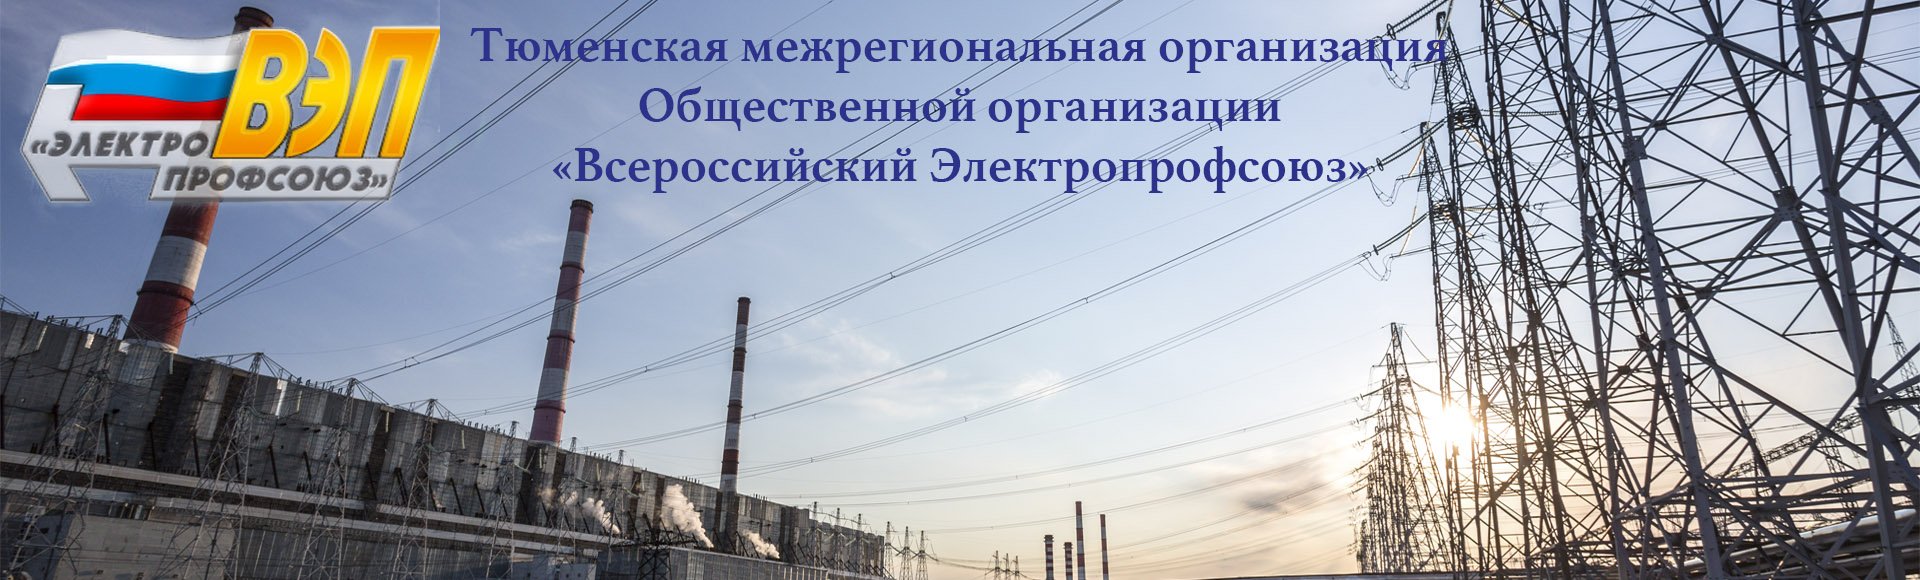 tymelprof.ru